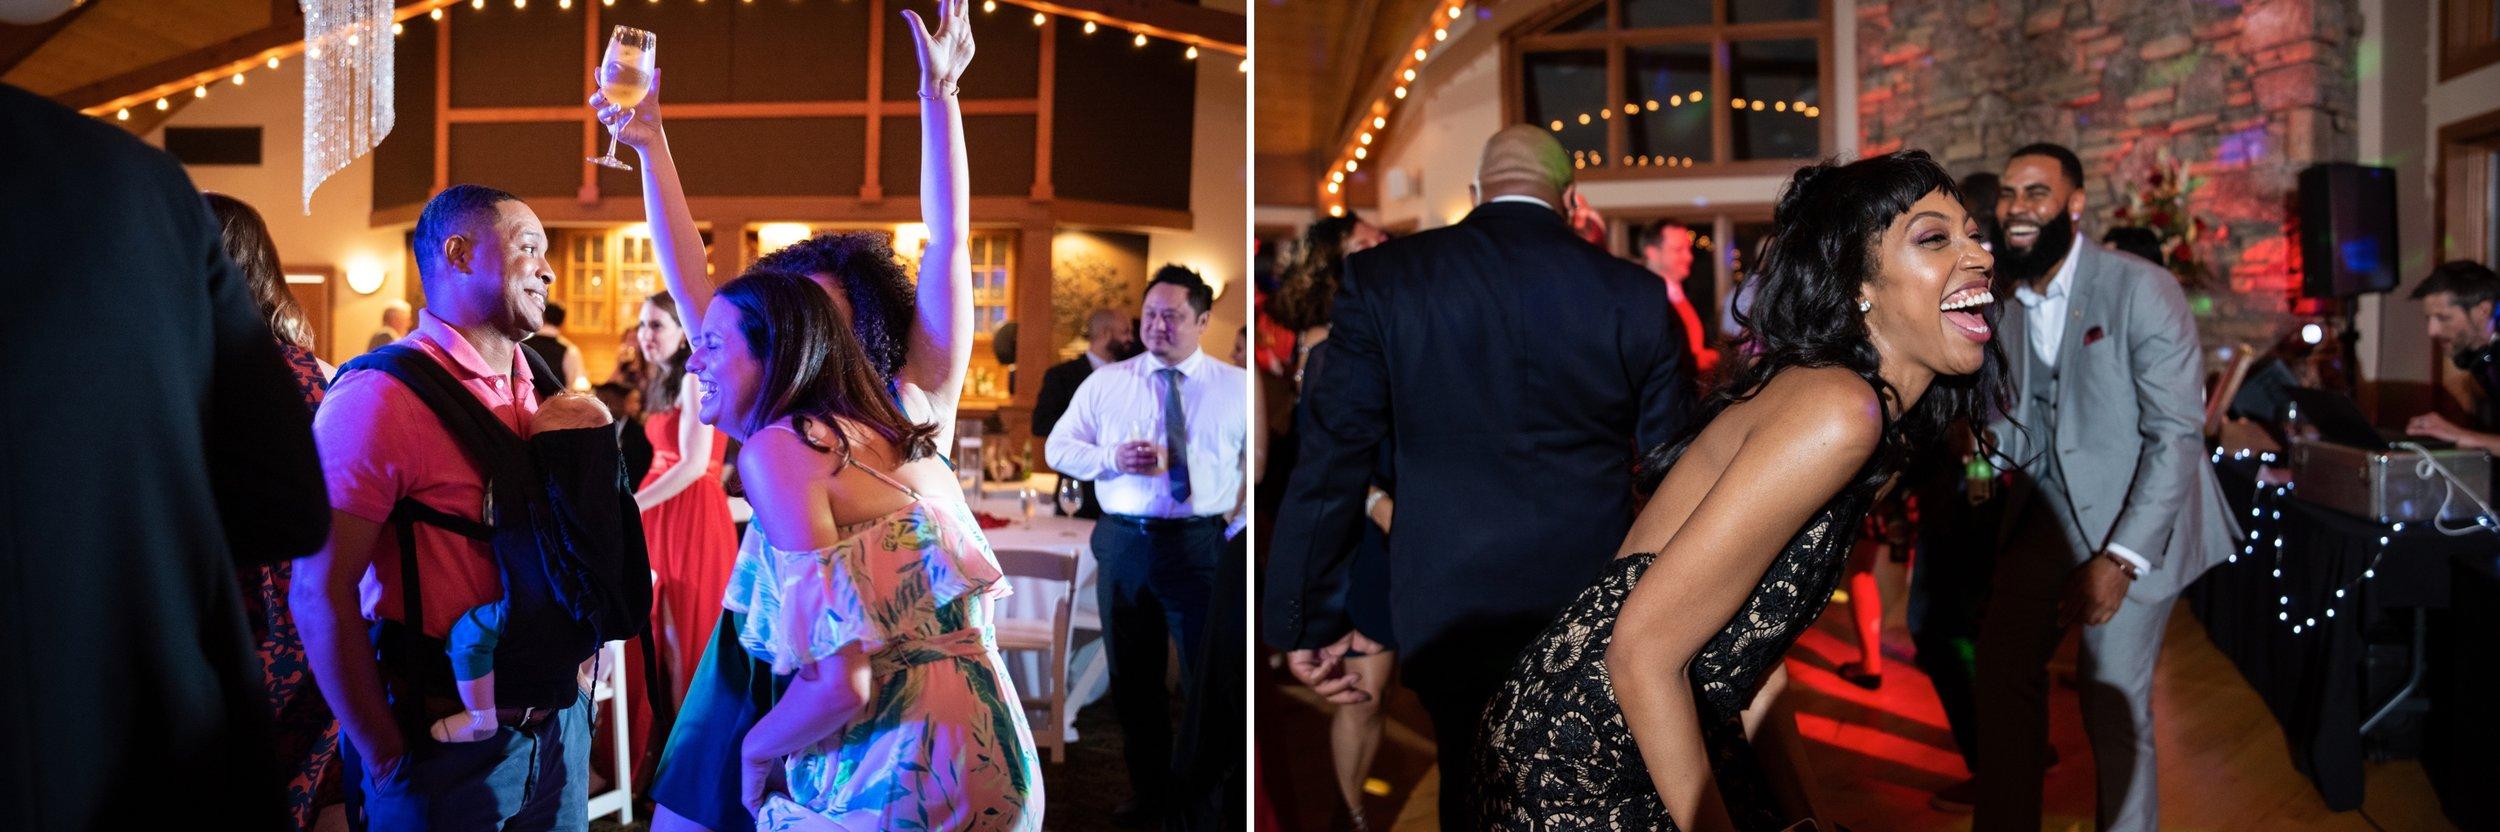 High Vista Weddings - Asheville Vendors 3 48.jpg